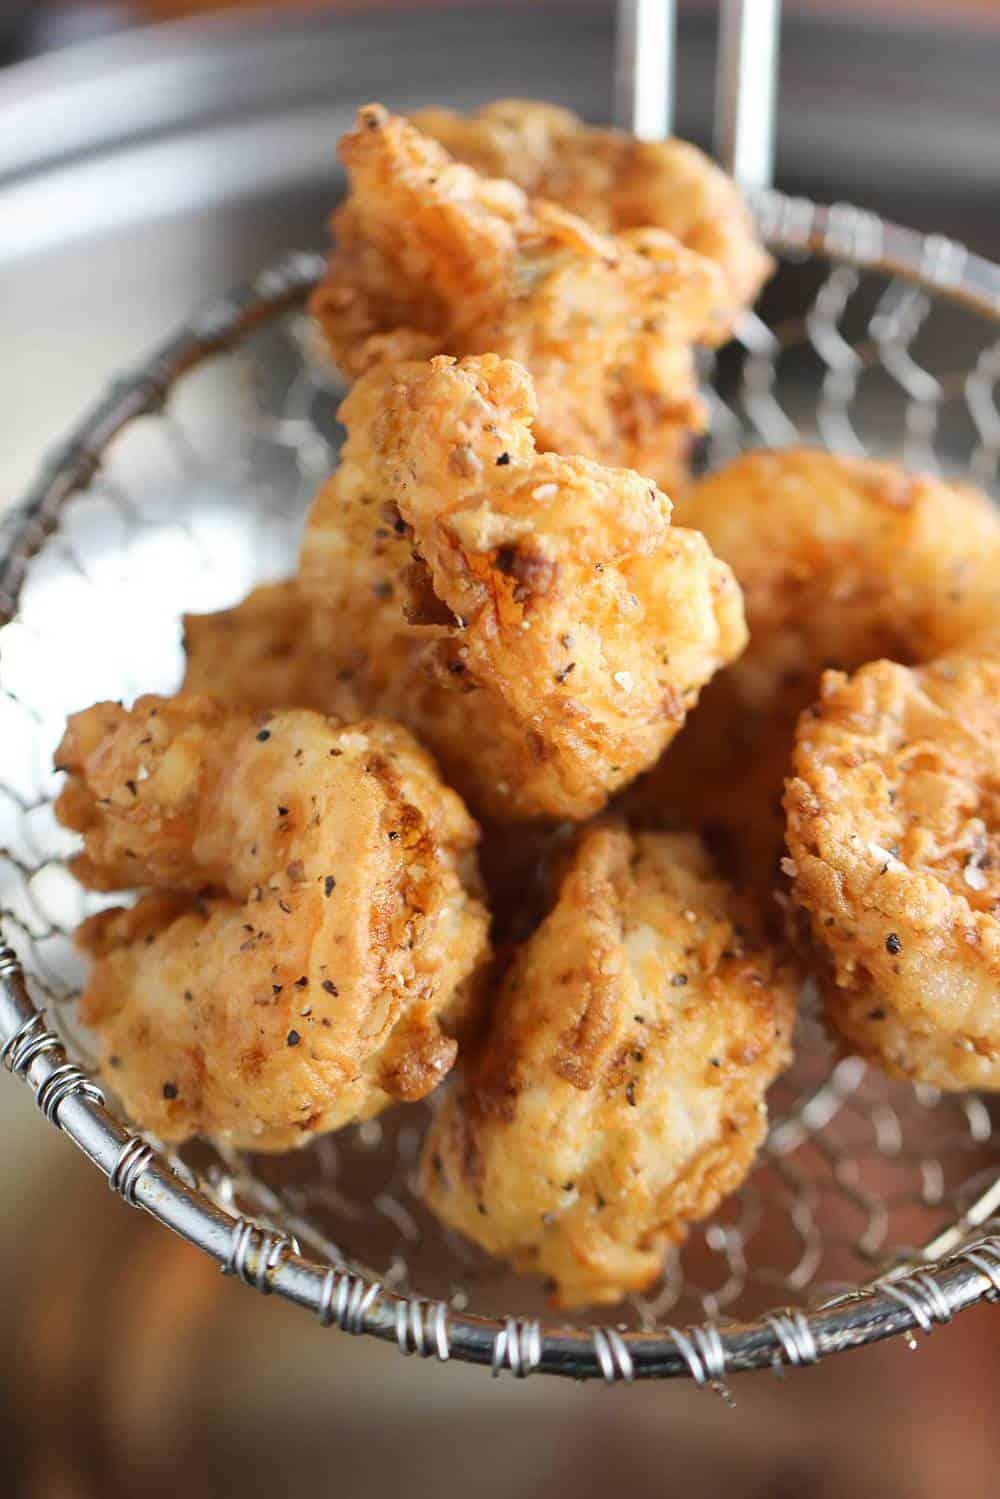 Southern Fried Shrimp recipe